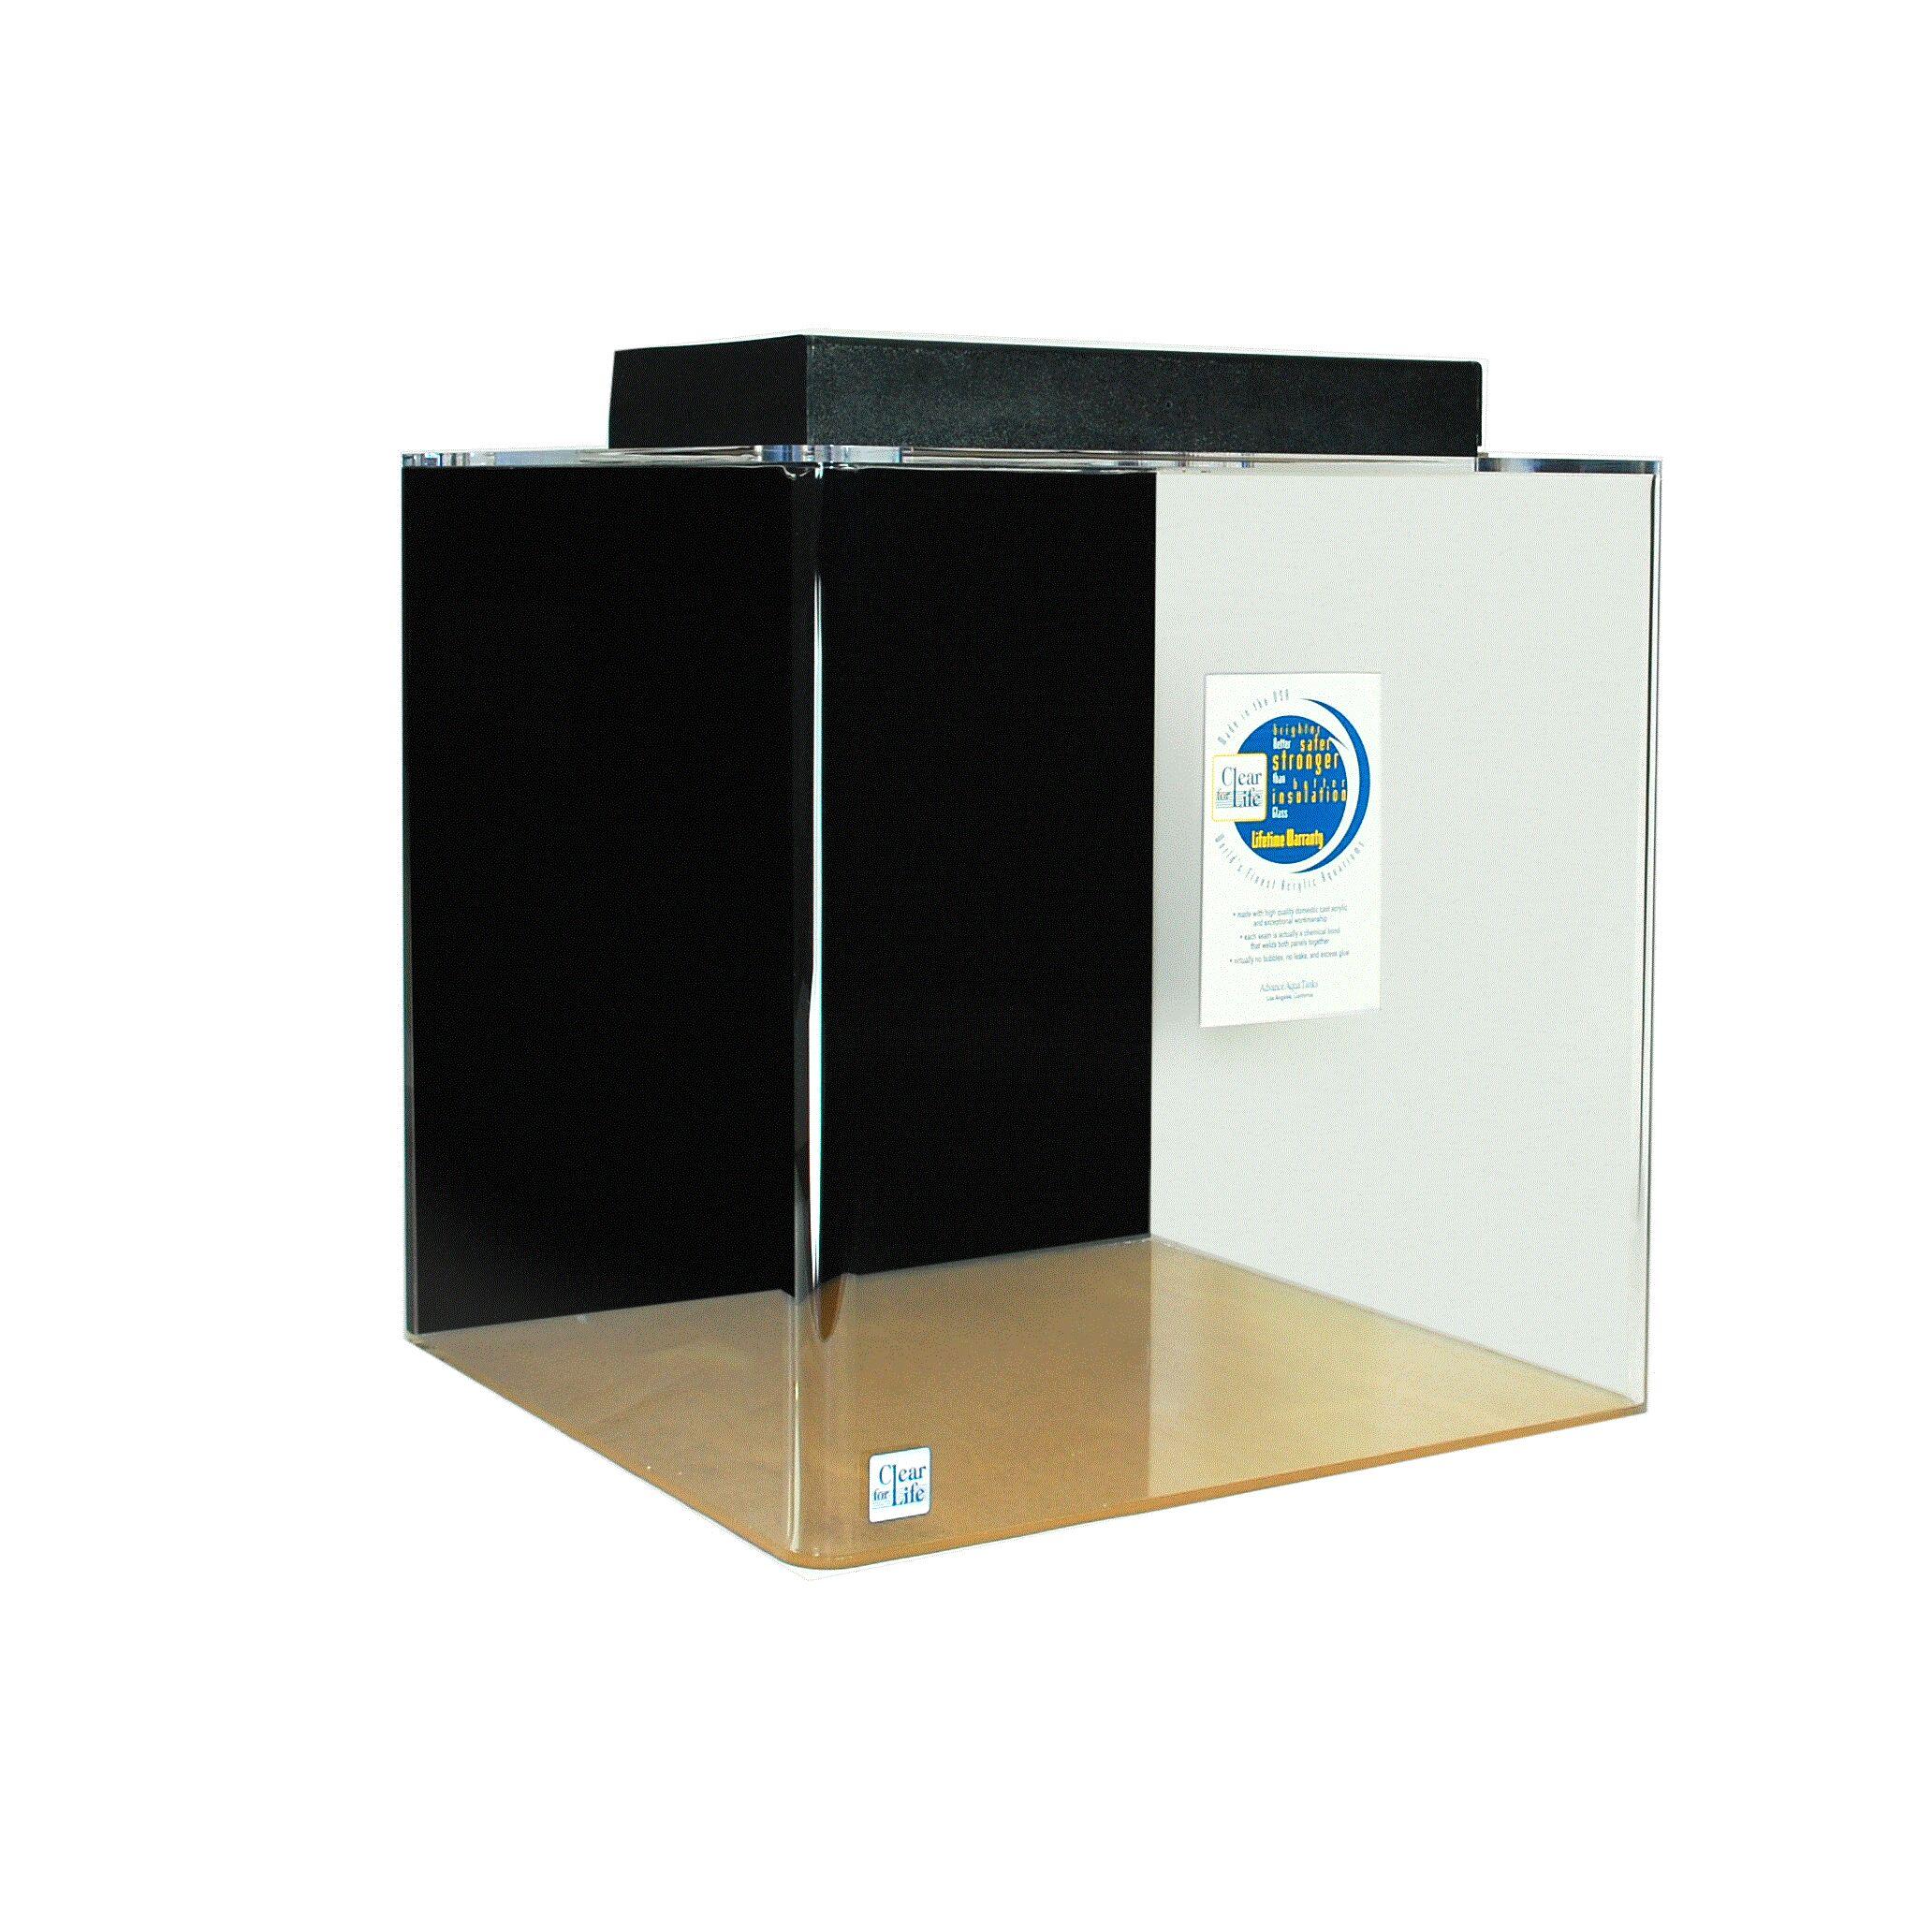 Cube Aquarium Tank Color: Black, Size: 18